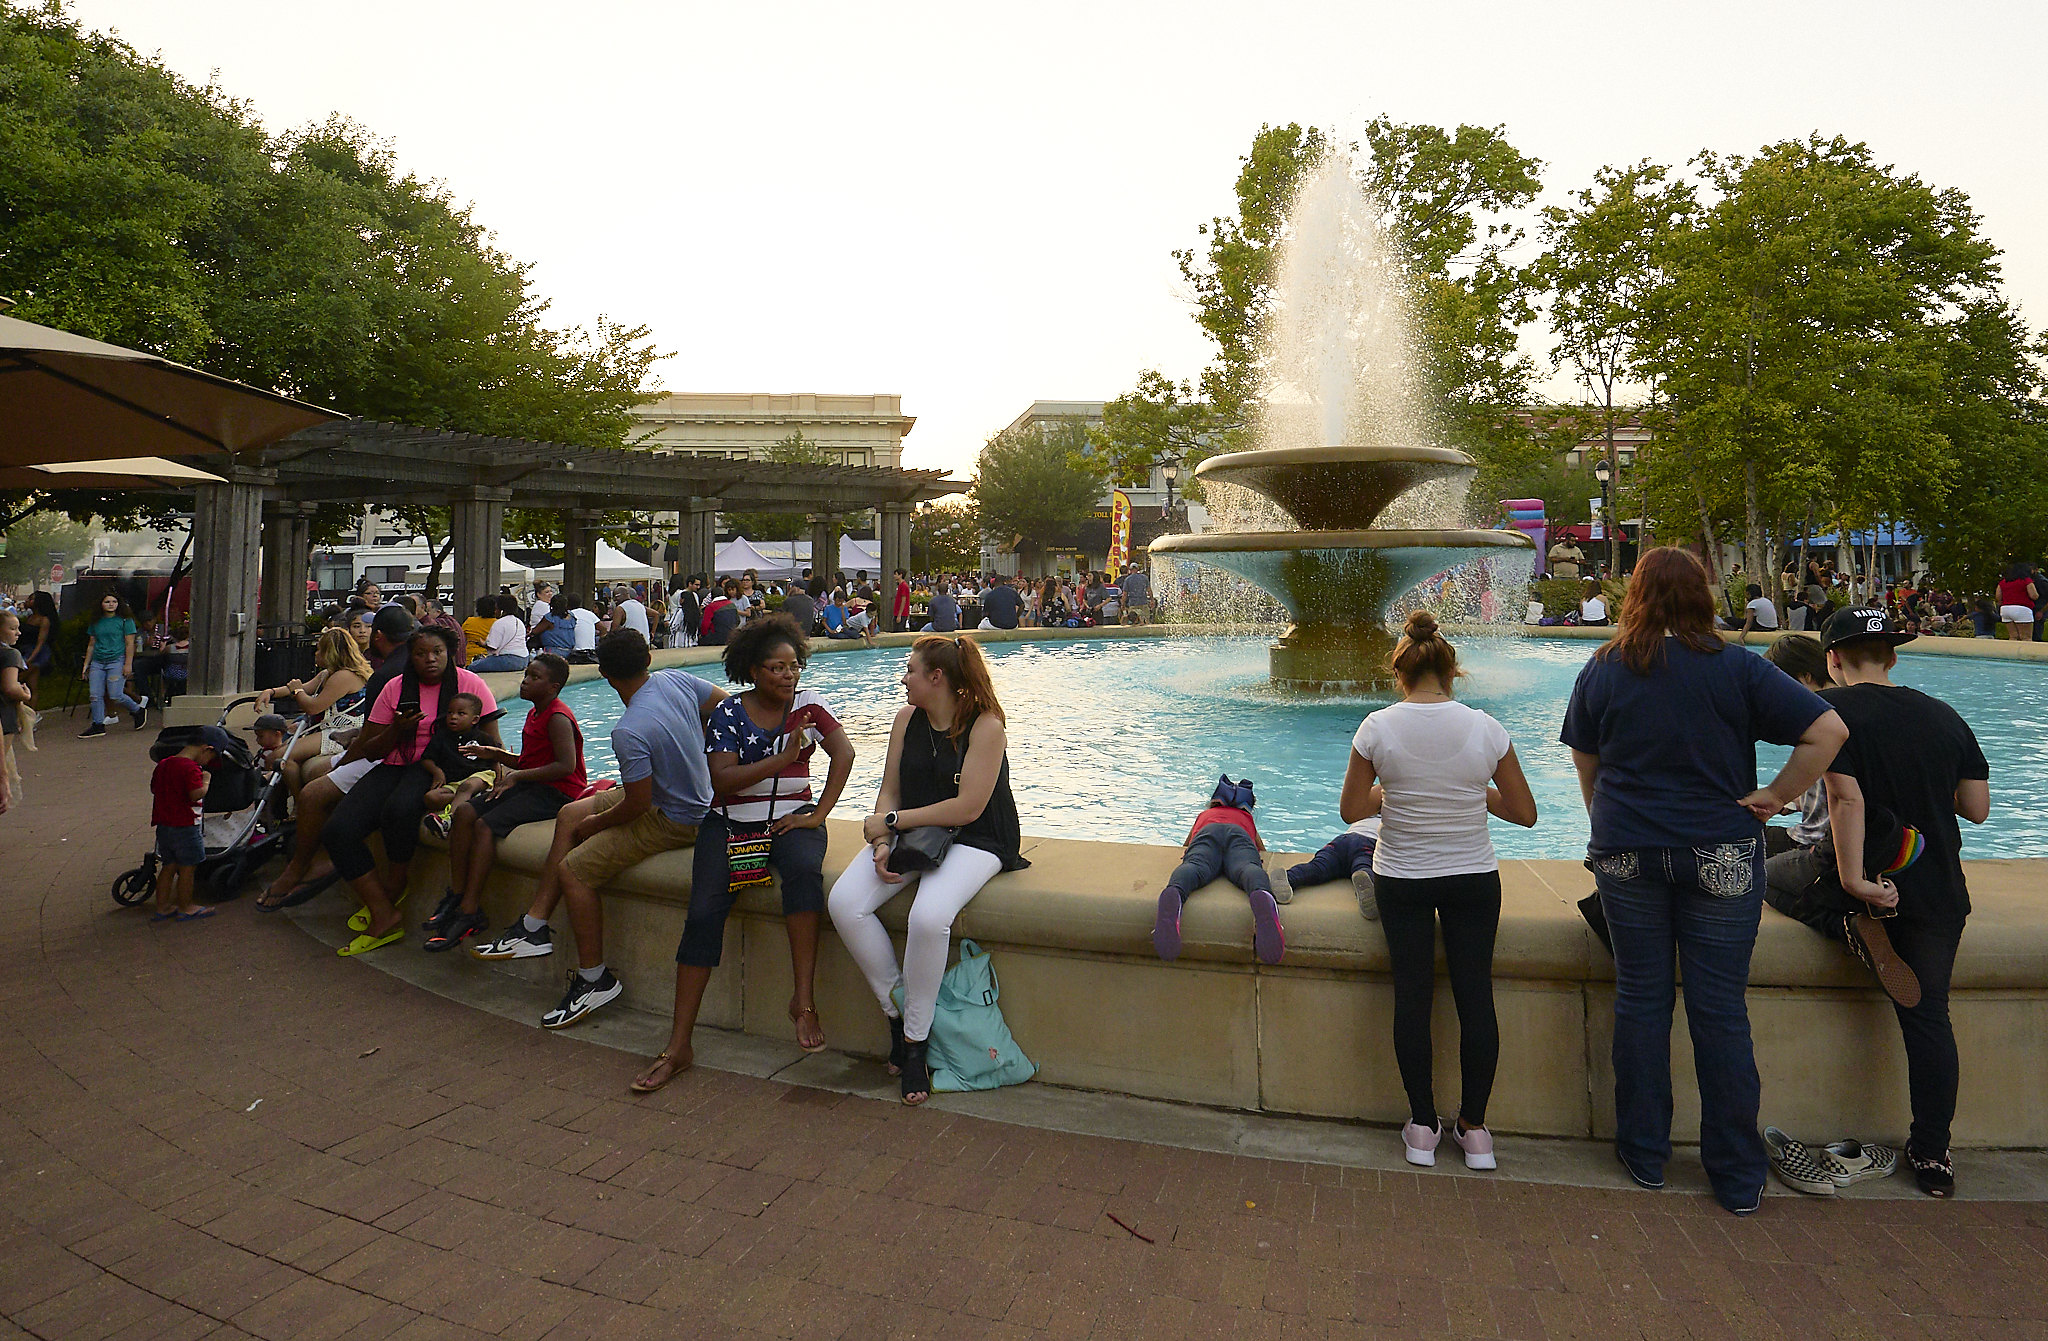 Crowd Around The Fountain